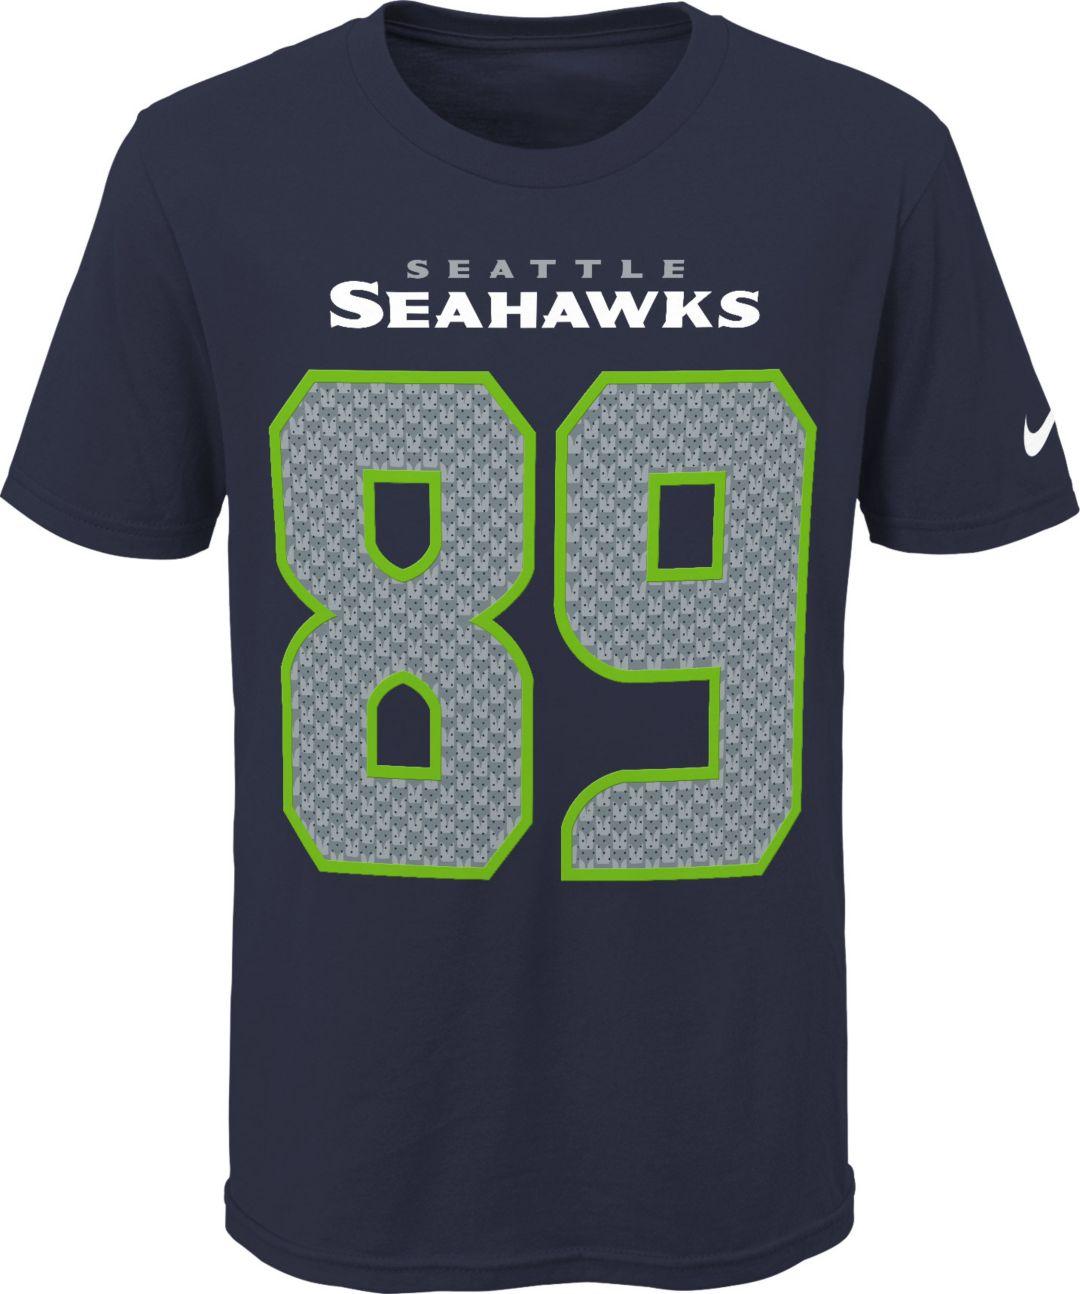 1ad8a79a Nike Youth Seattle Seahawks Doug Baldwin #89 Pride Navy Player T-Shirt